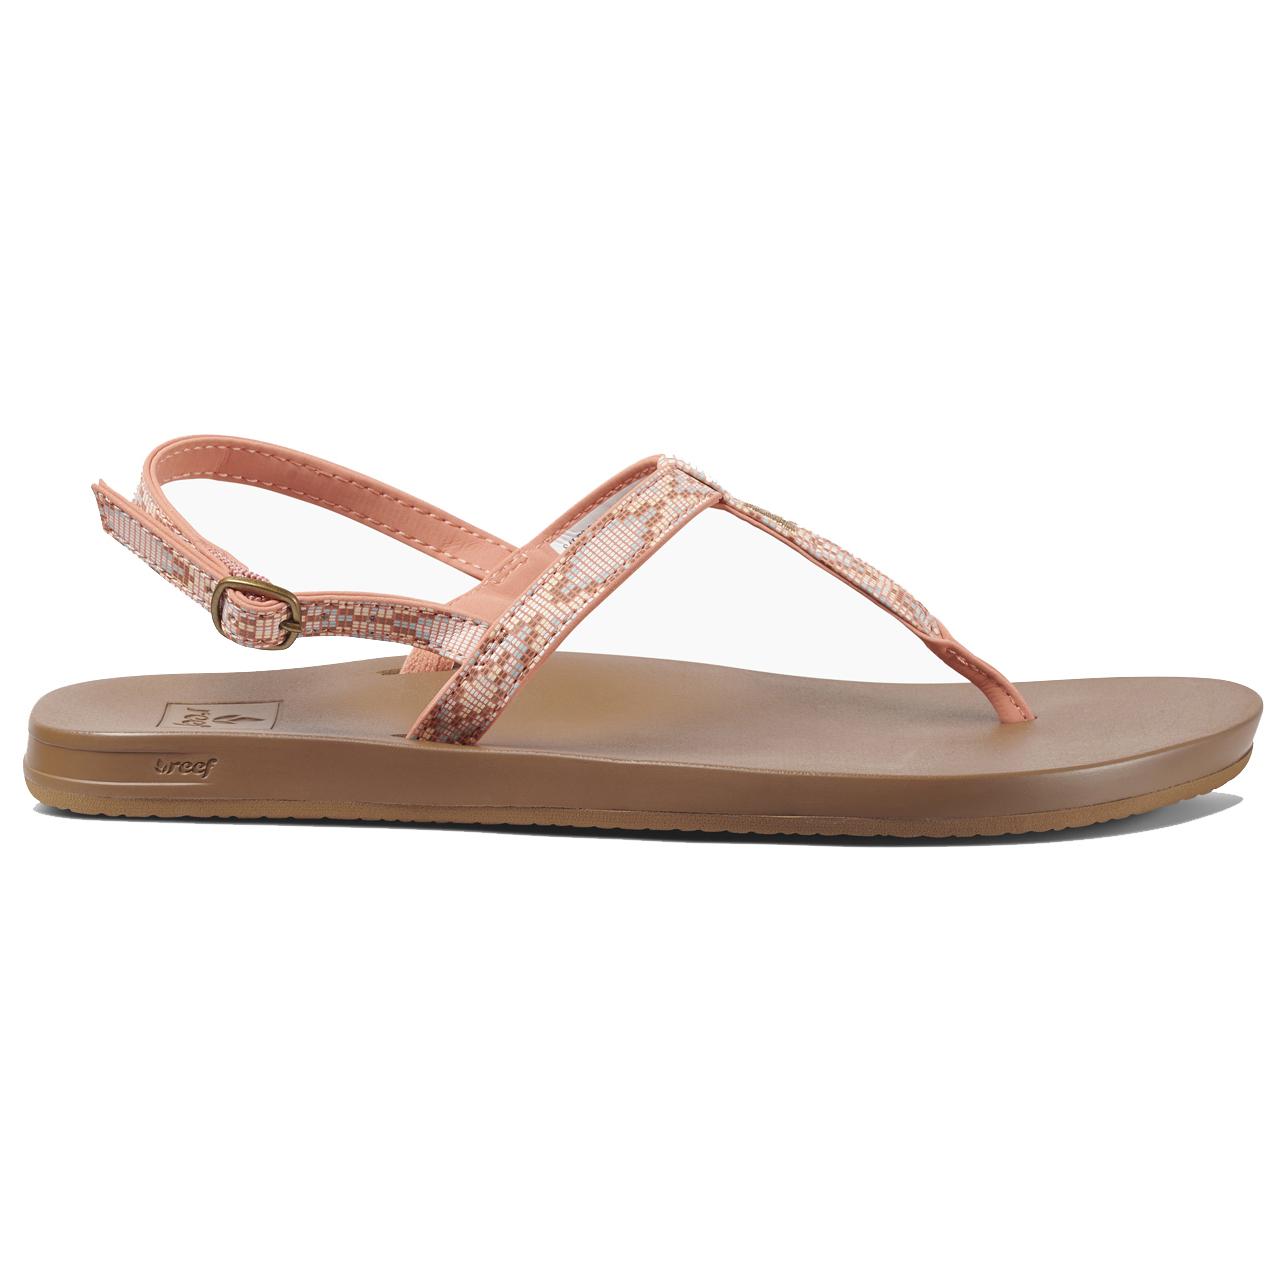 a17e18253b7f Reef - Women s Cushion Bounce Slim Tee - Sandals